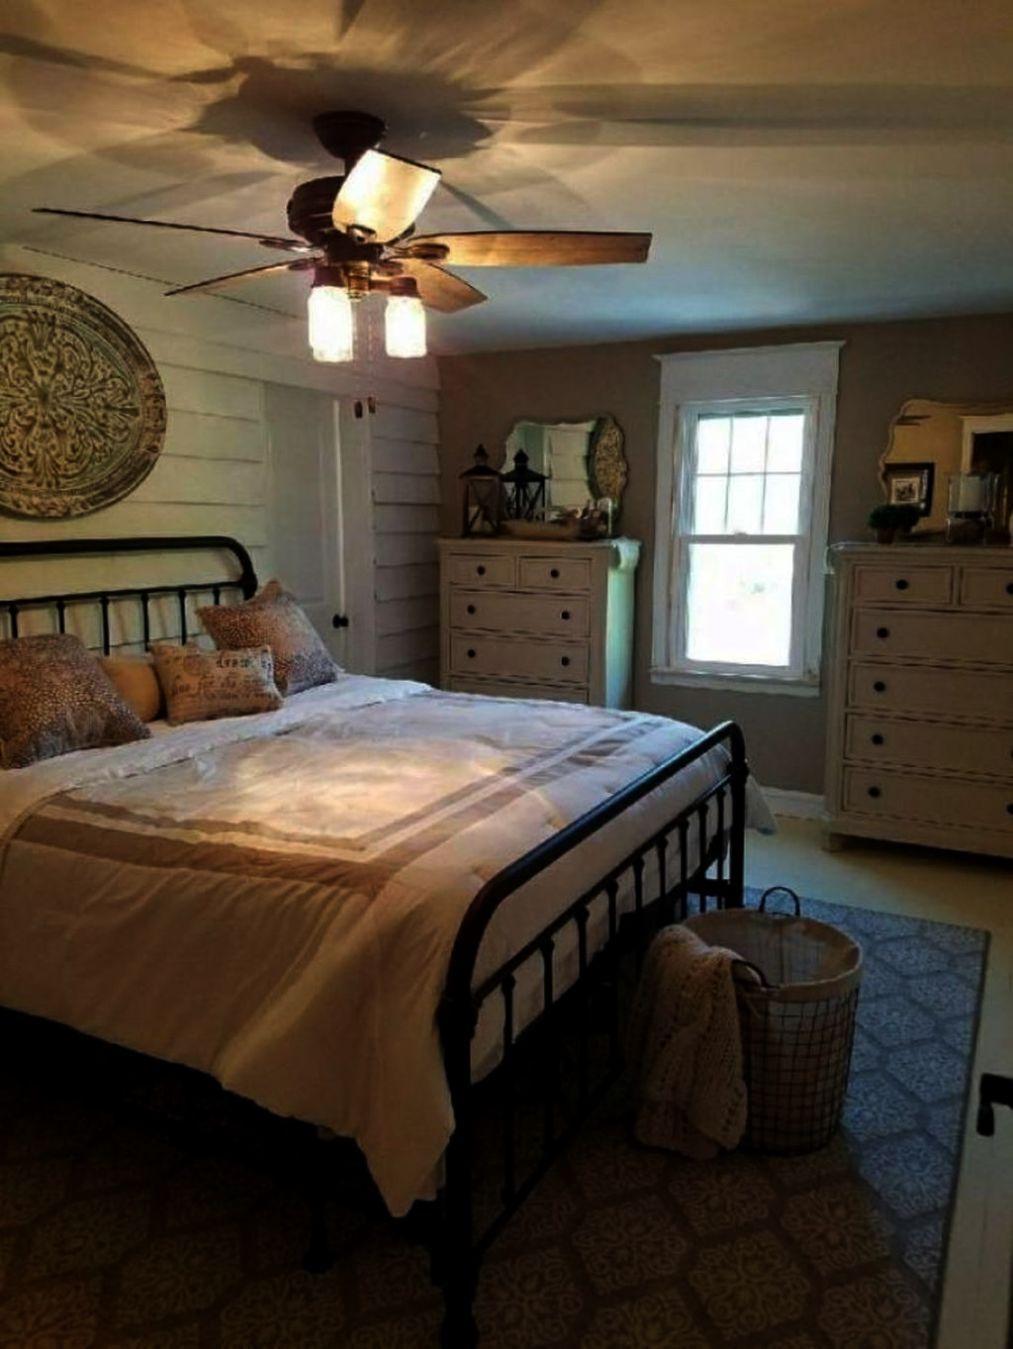 Bedroom Furniture For Sale Aberdeen next Furniture Rental ...